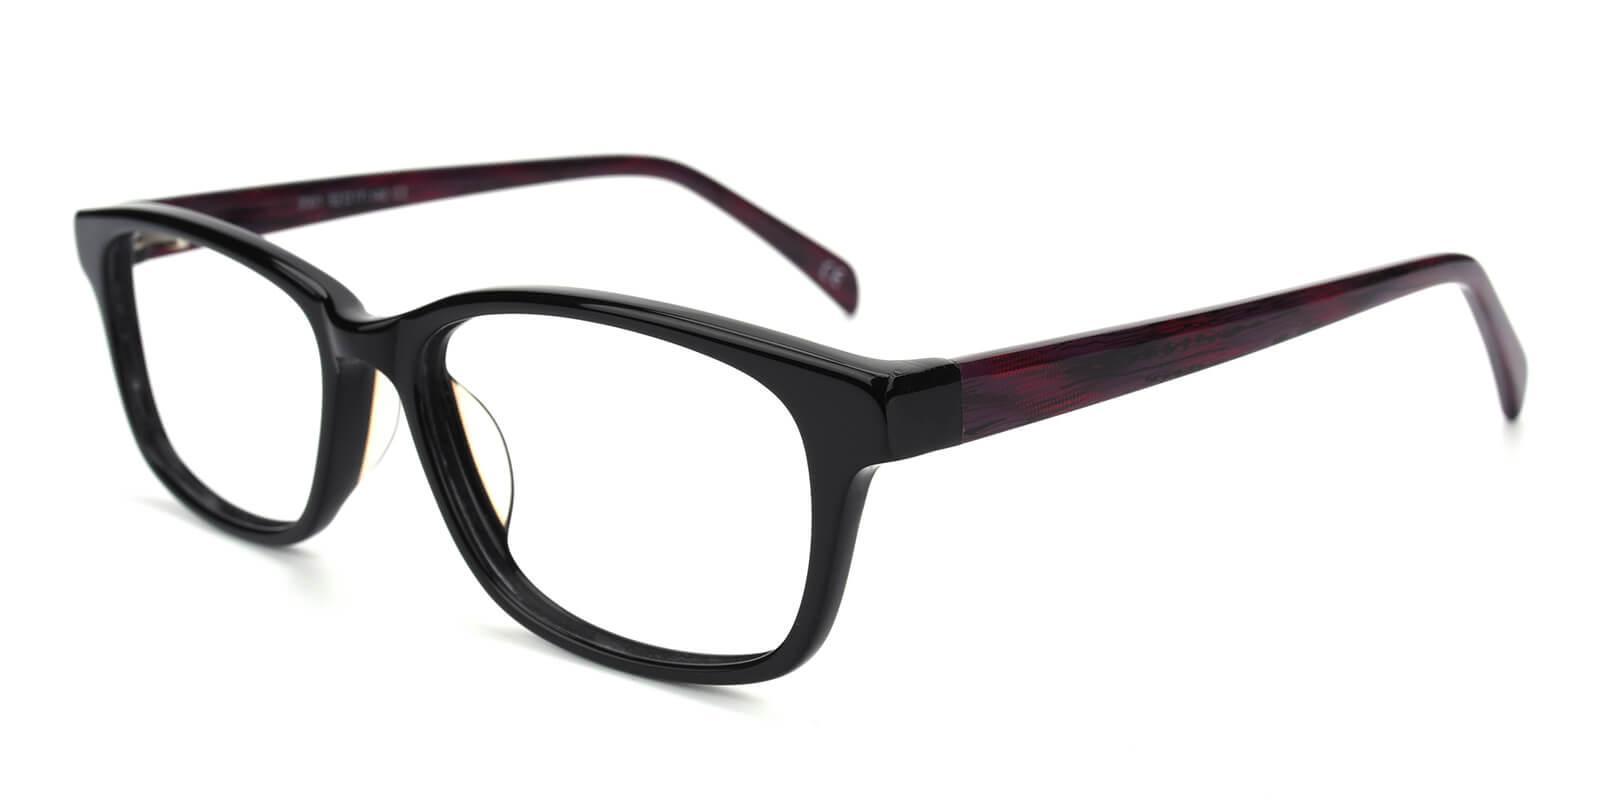 Milo-Purple-Rectangle-Acetate-Eyeglasses-additional1